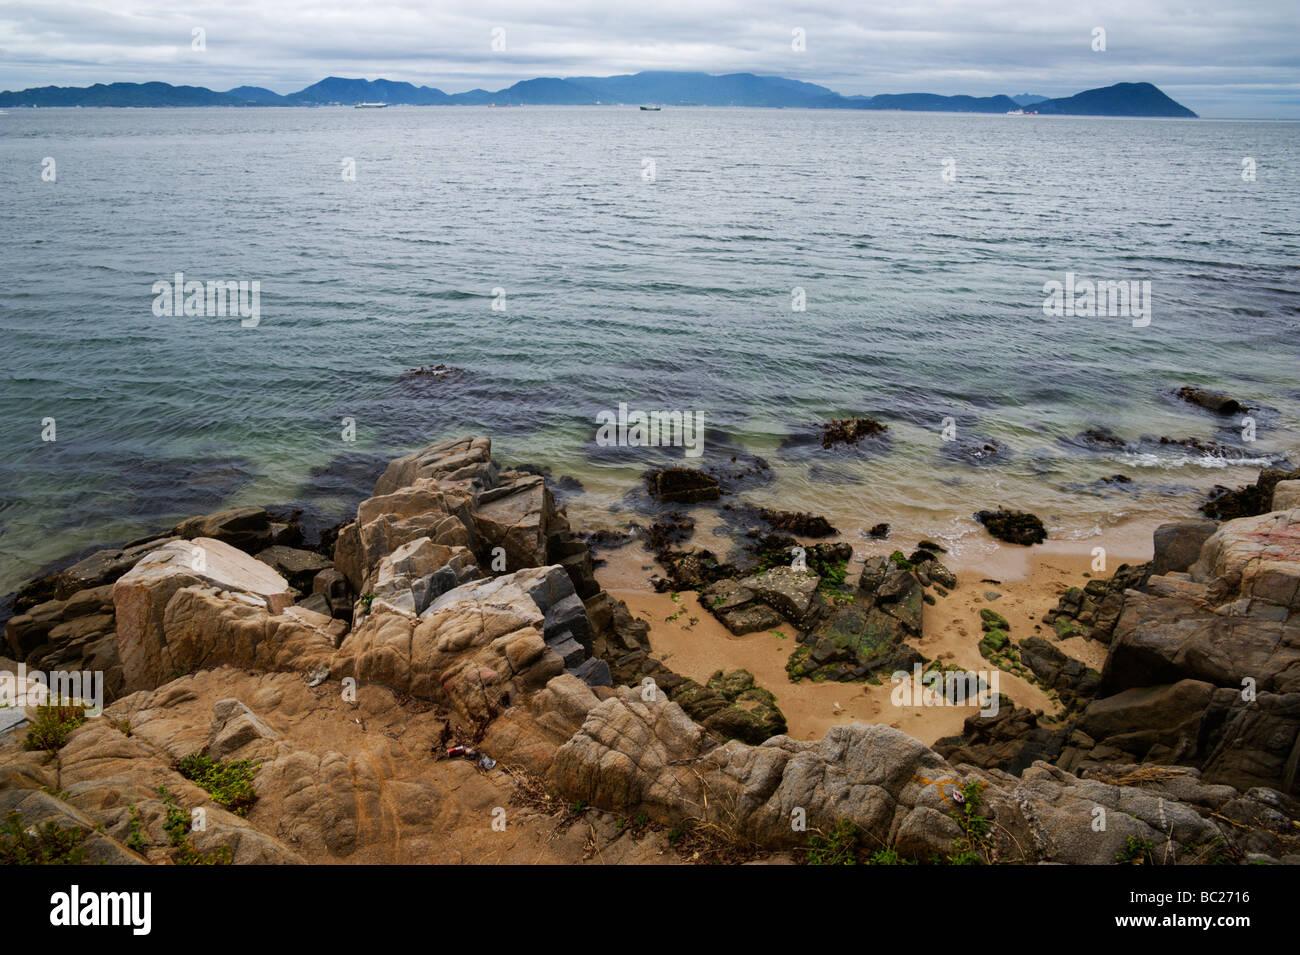 Shodoshima across the Seto Inland Sea from Shikoku Japan - Stock Image